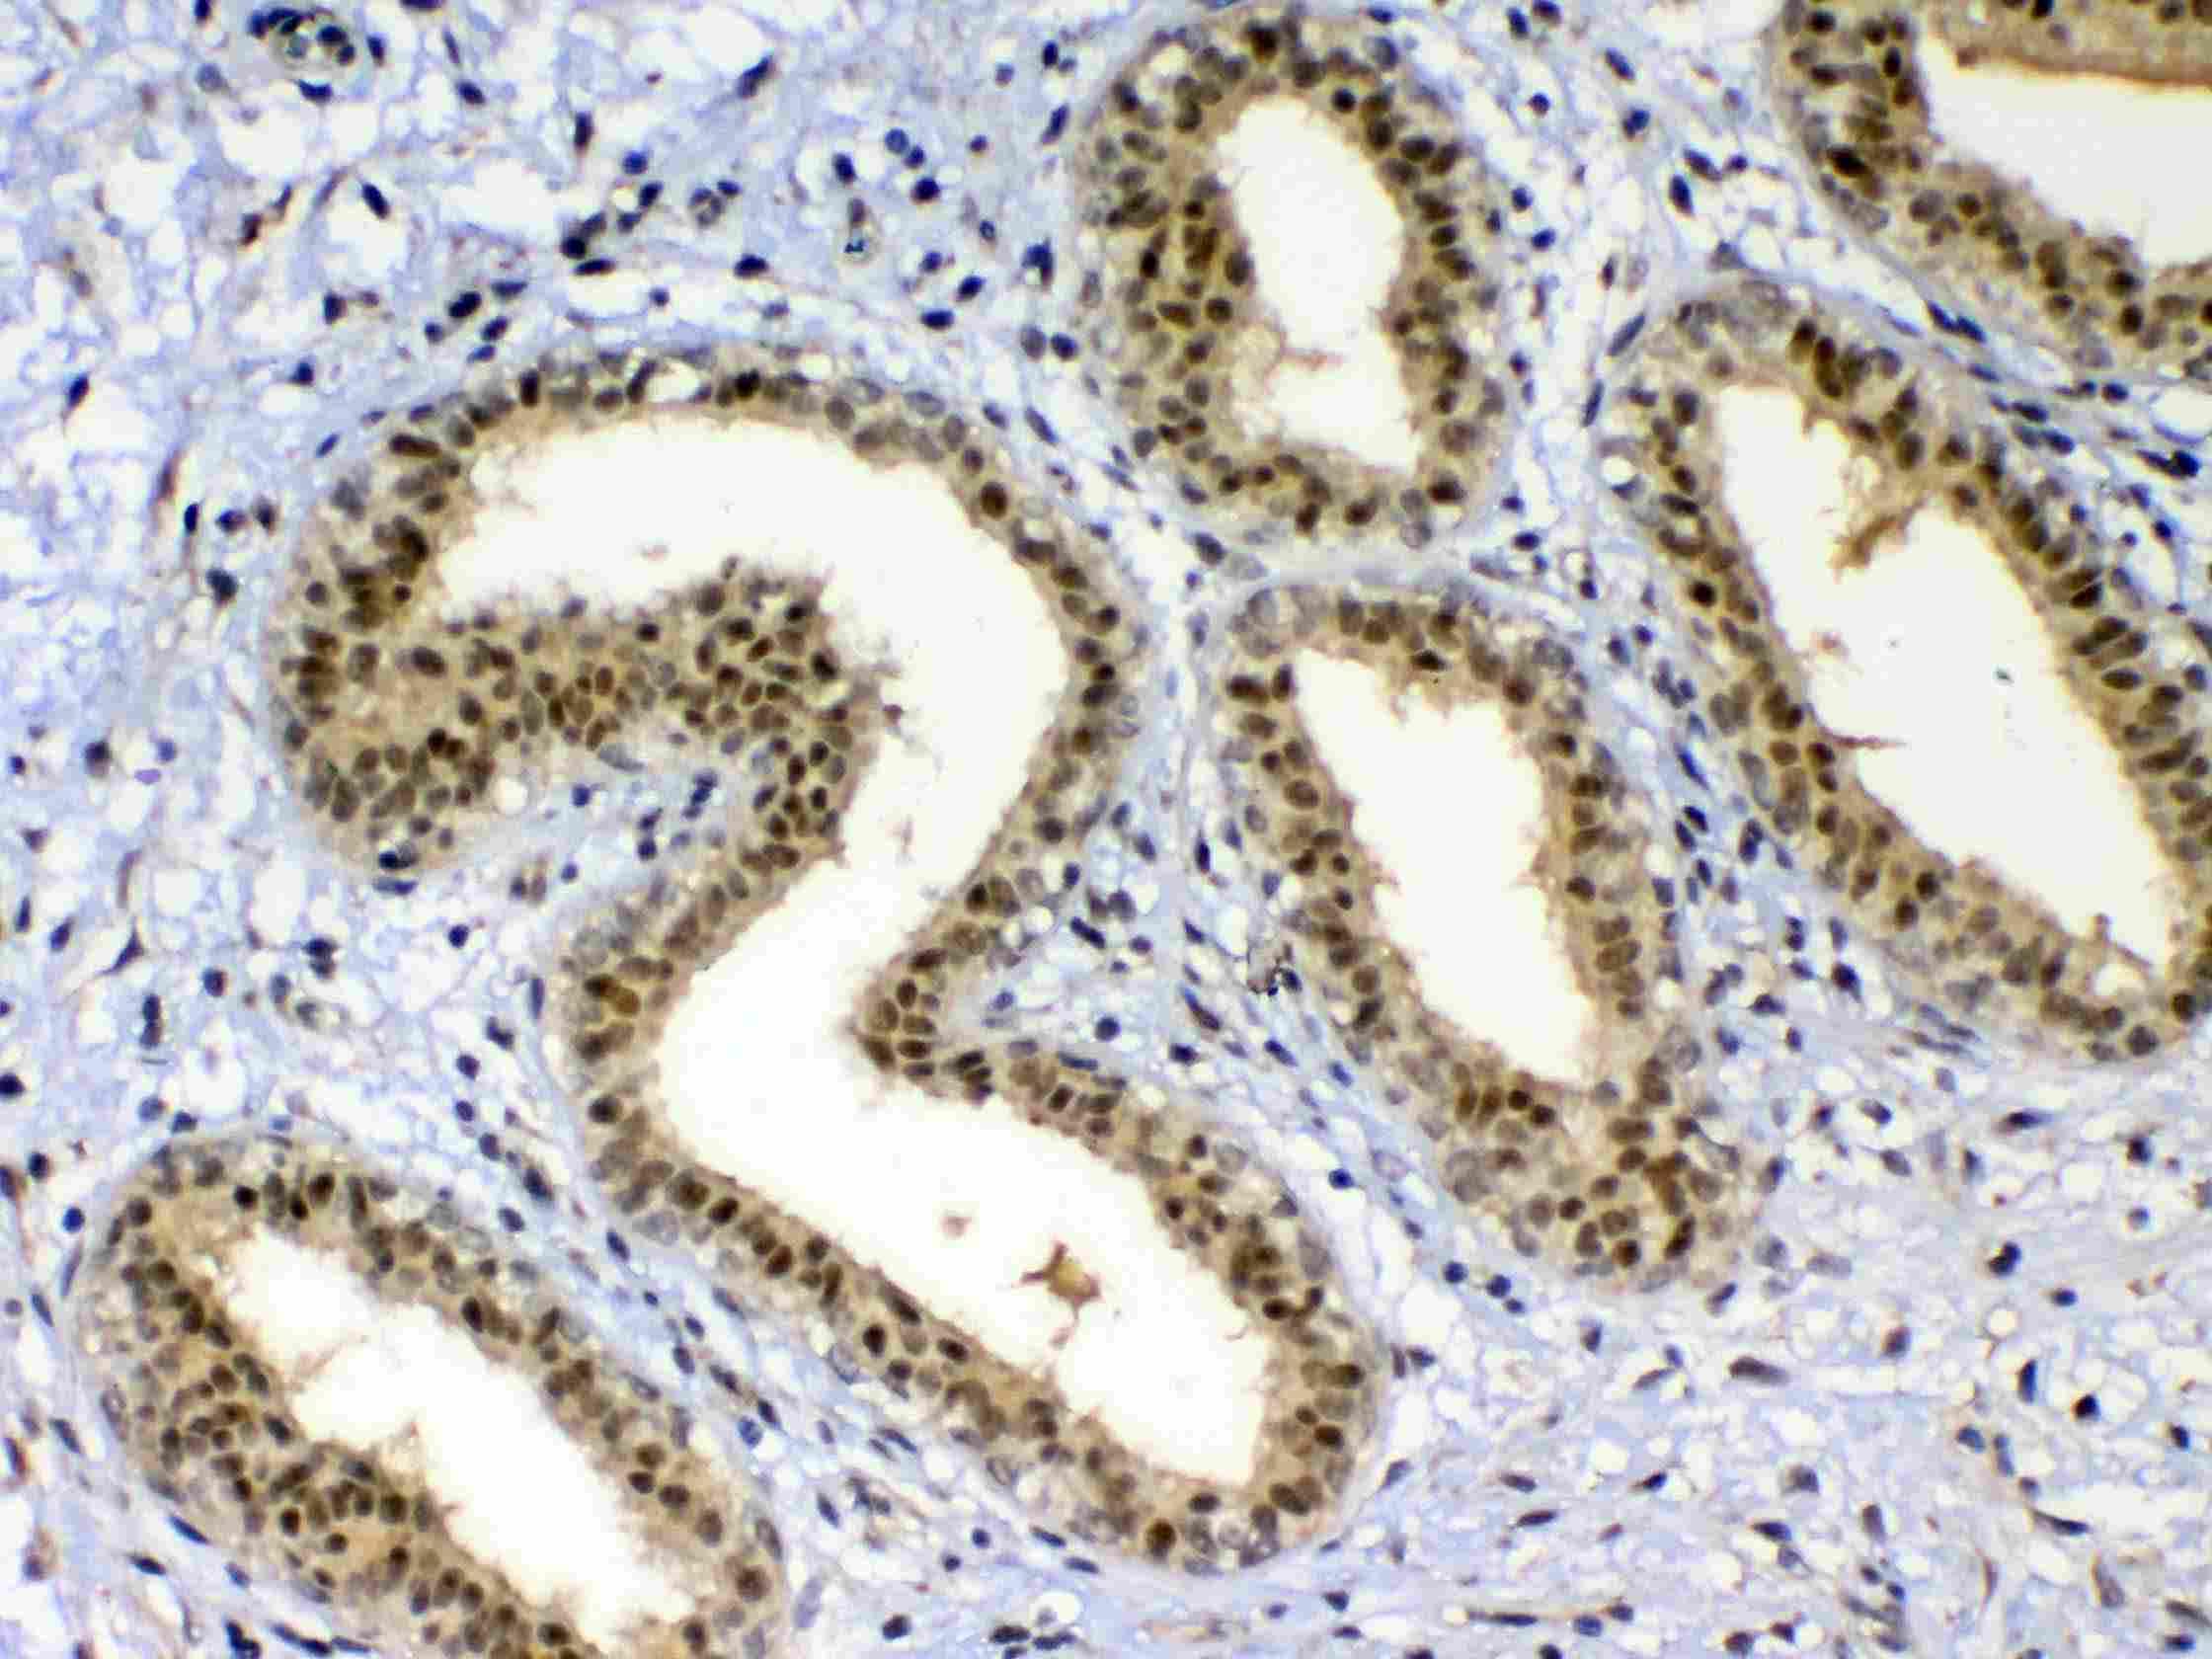 Anti-XRCC1 Picoband antibody SKU: A00571